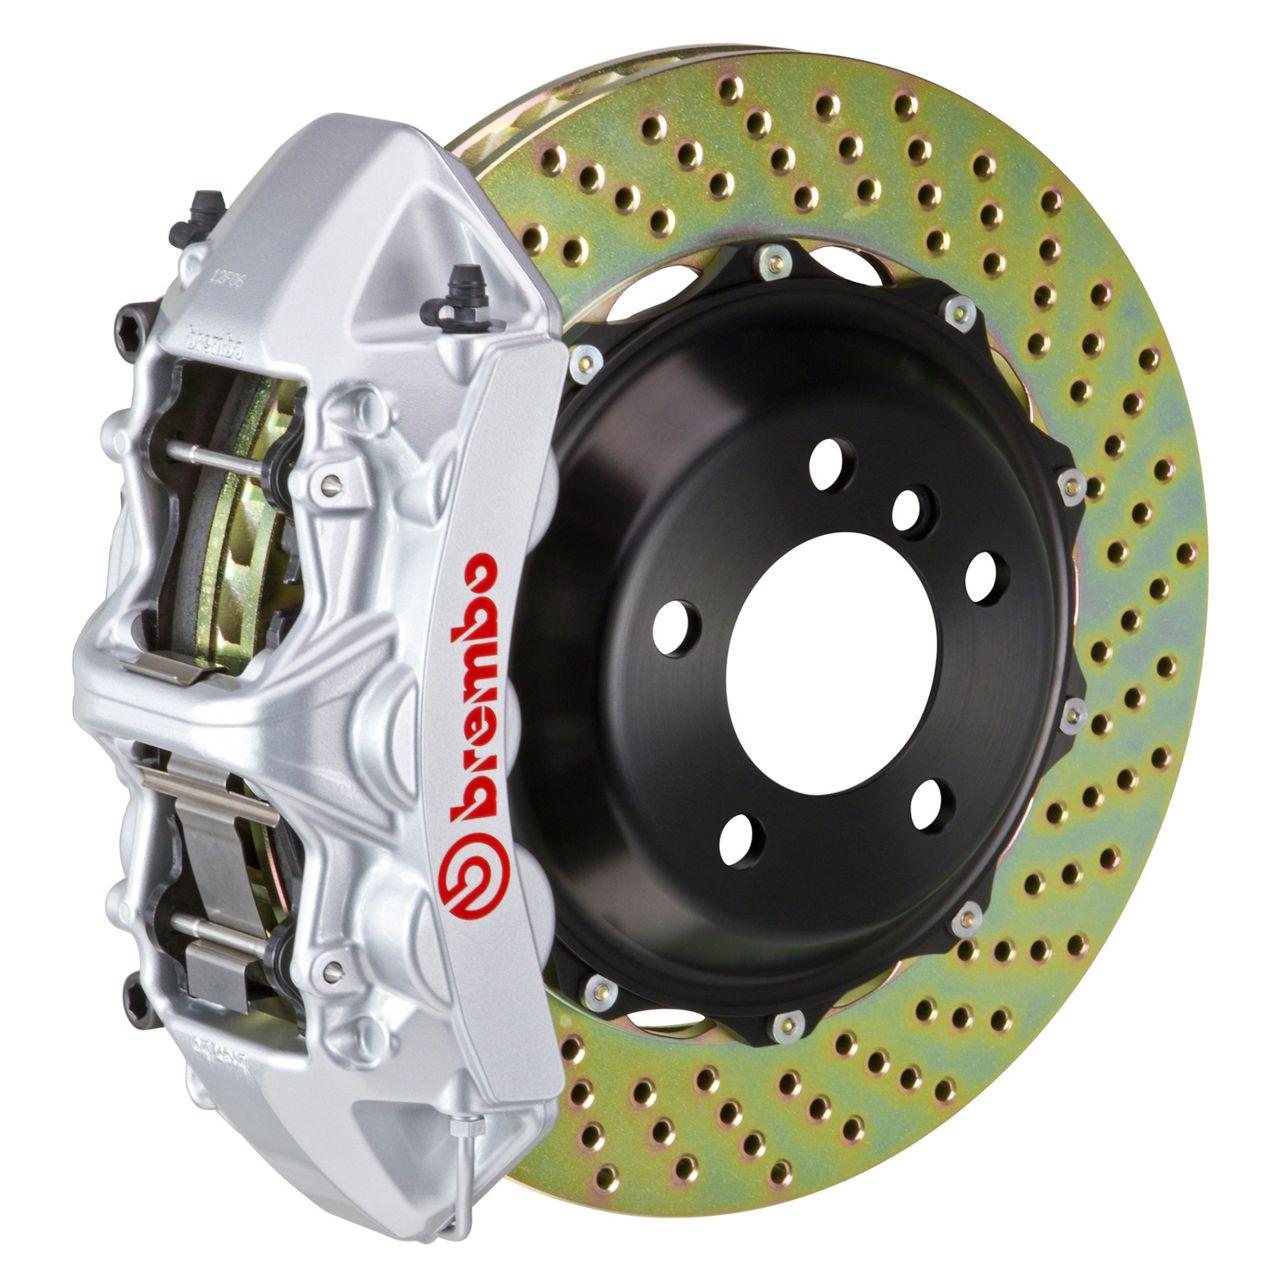 Brembo GT Series 6-Piston Front Big Brake Kit - 14 in. 2-Piece Cross-Drilled Rotors - Silver (09-10 R/T, SE)